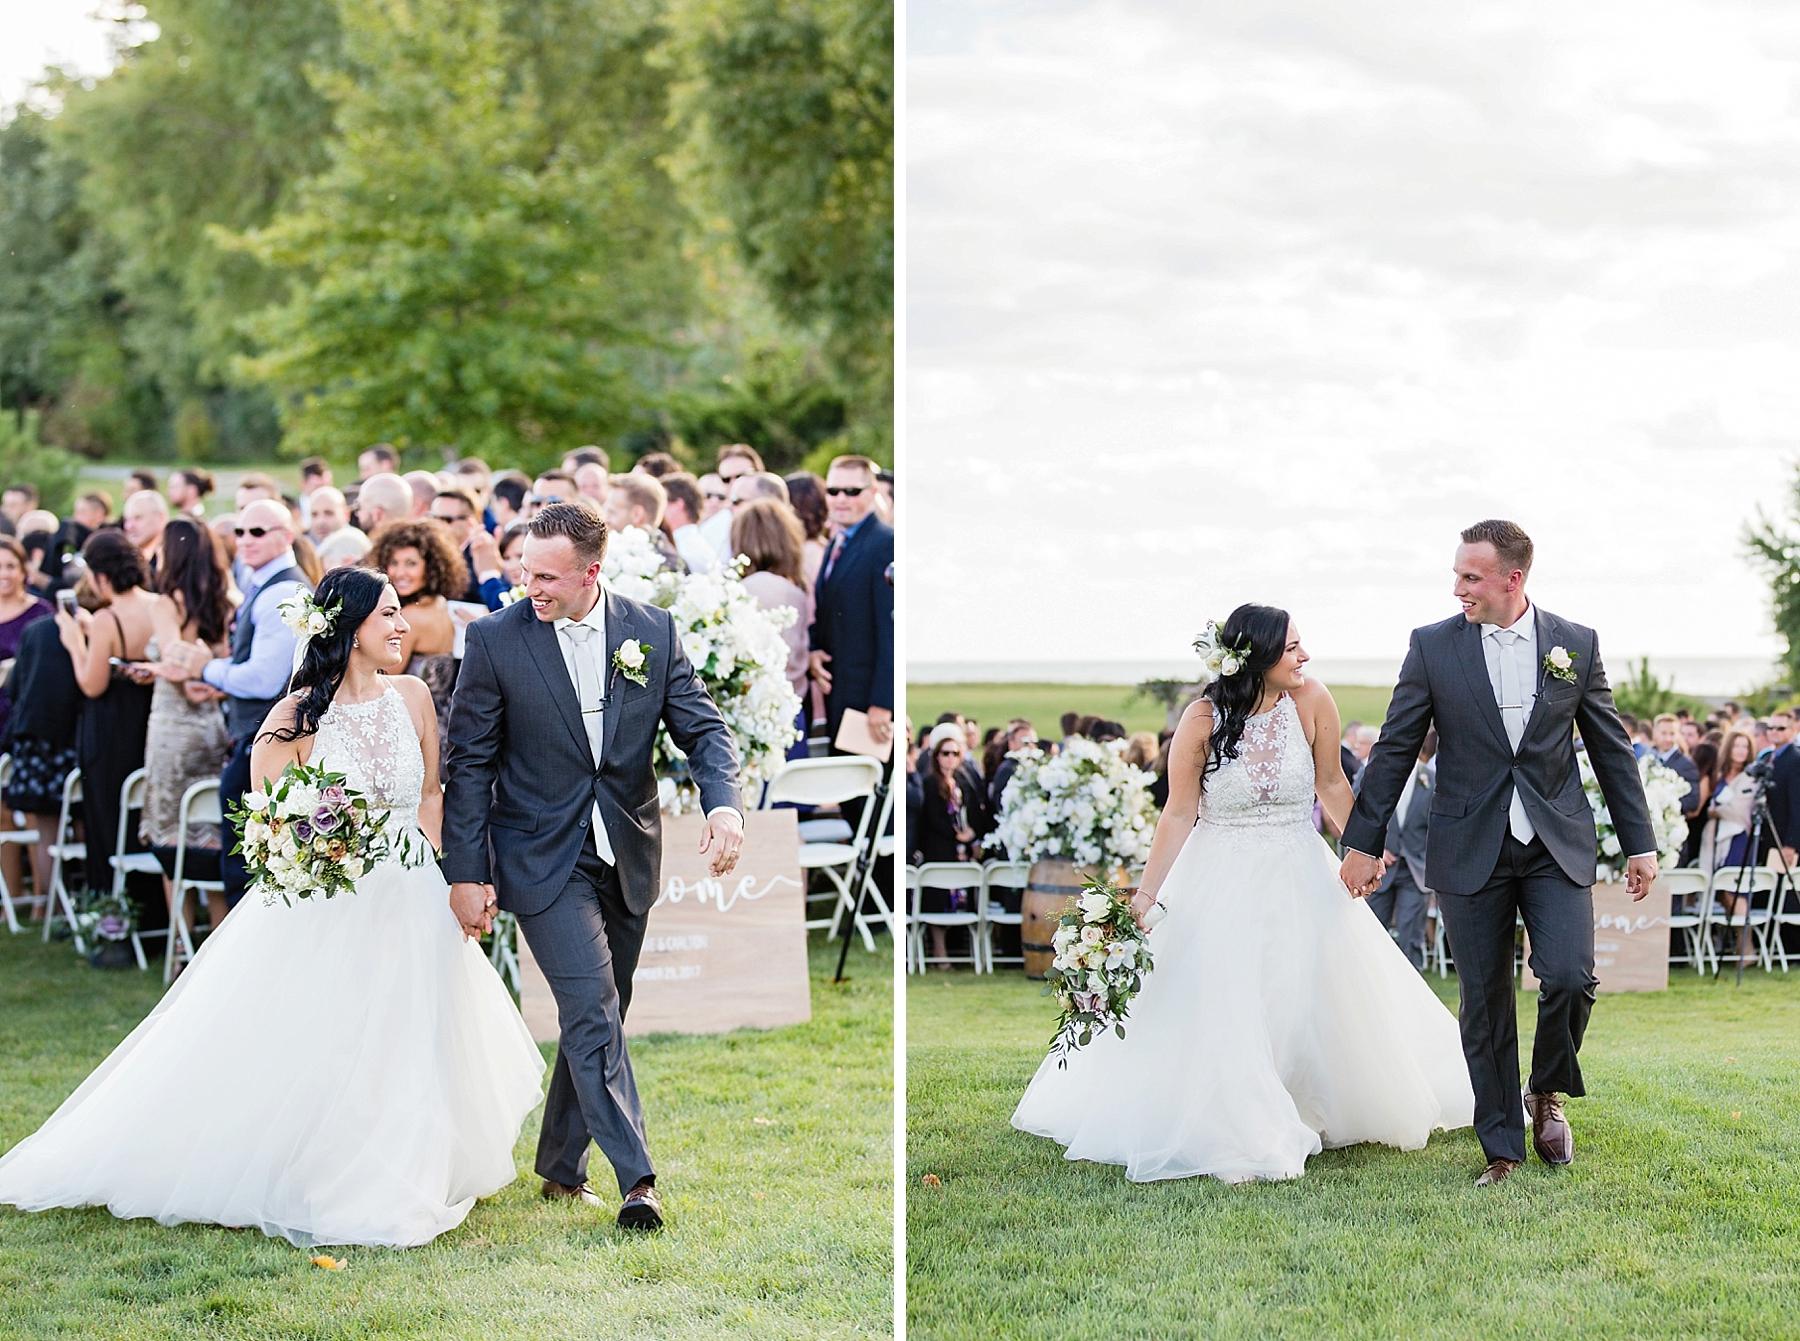 windsor-wedding-photographer-sprucewood-shores-winery-wedding-niagara-on-the-lake-wedding-photographer-eryn-shea-photography_0058.jpg